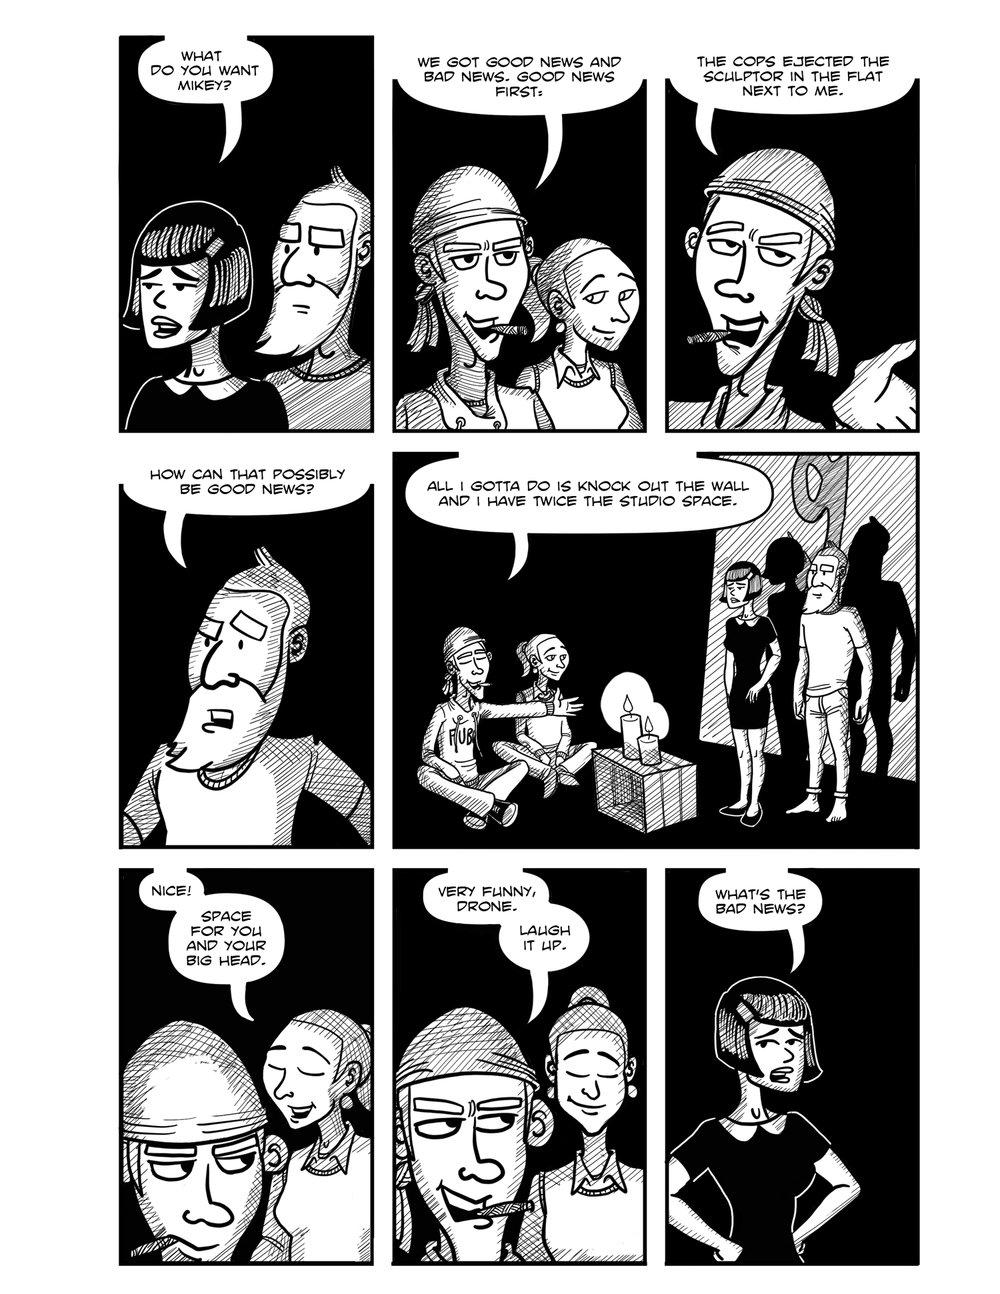 PAGE-171.jpg